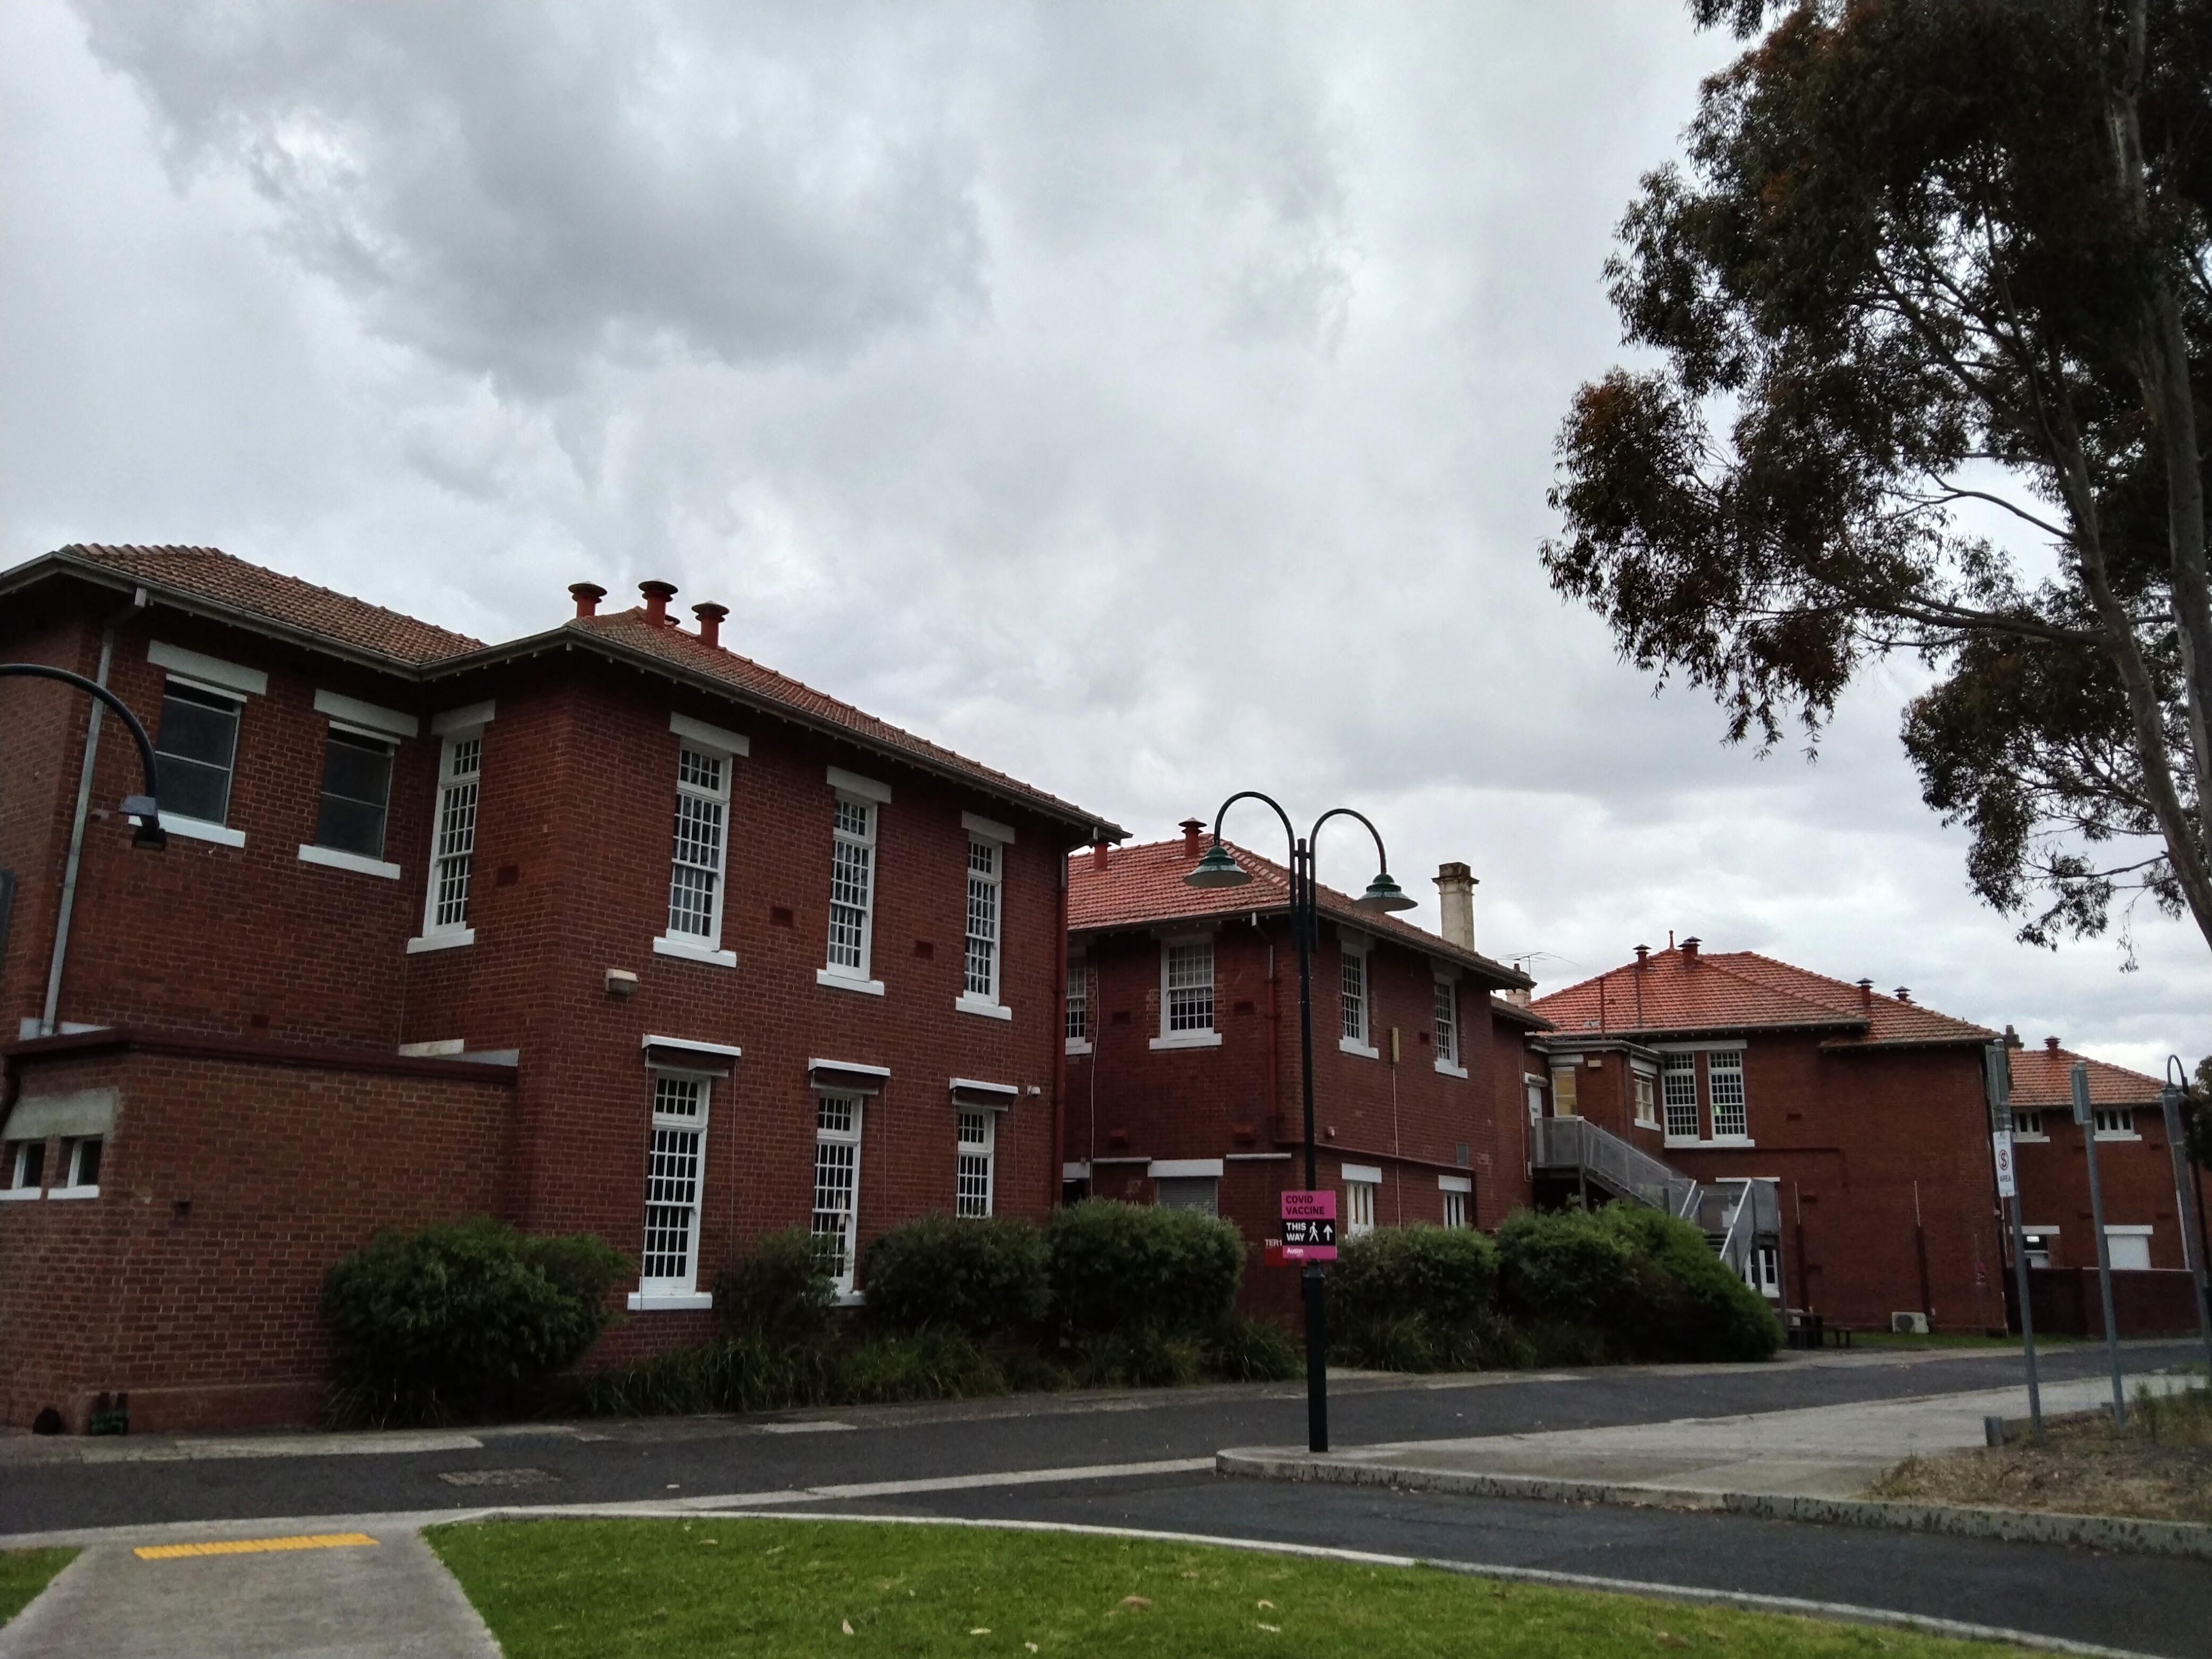 Old, handsome, red brick buildings